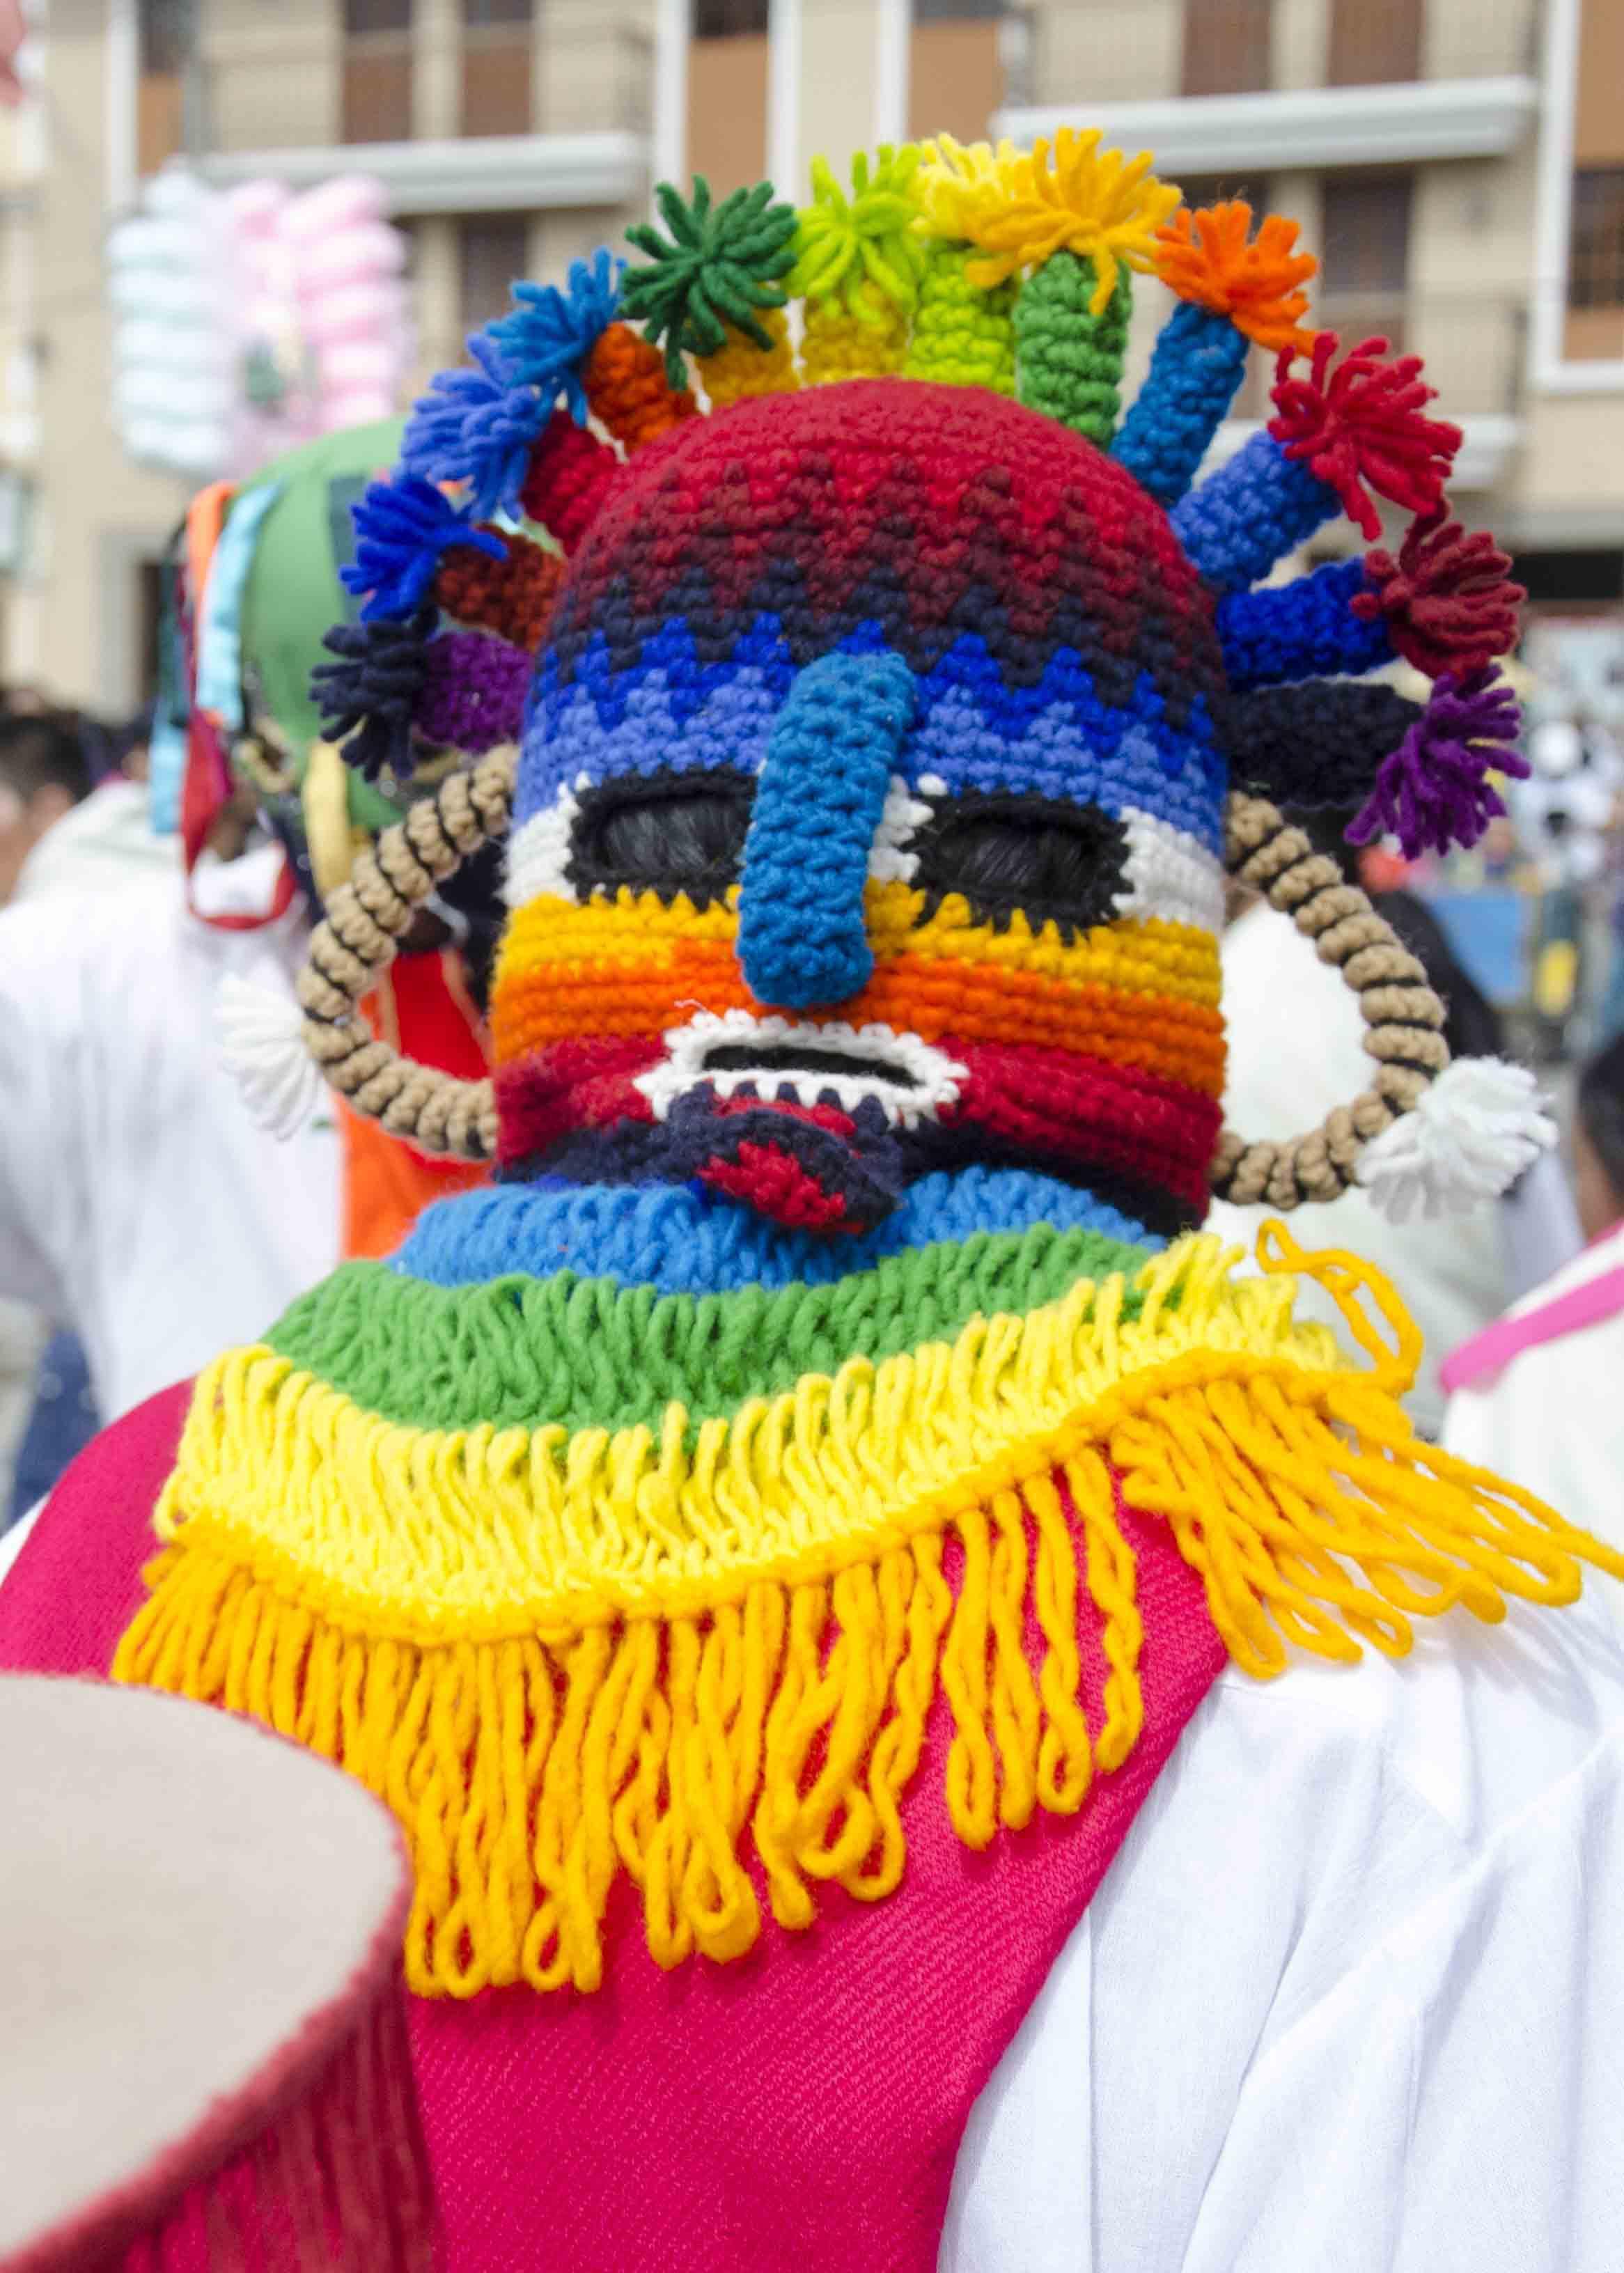 Aya Huma, Taking of the Plaza, School Children Day, Cotacachi, Ecuador